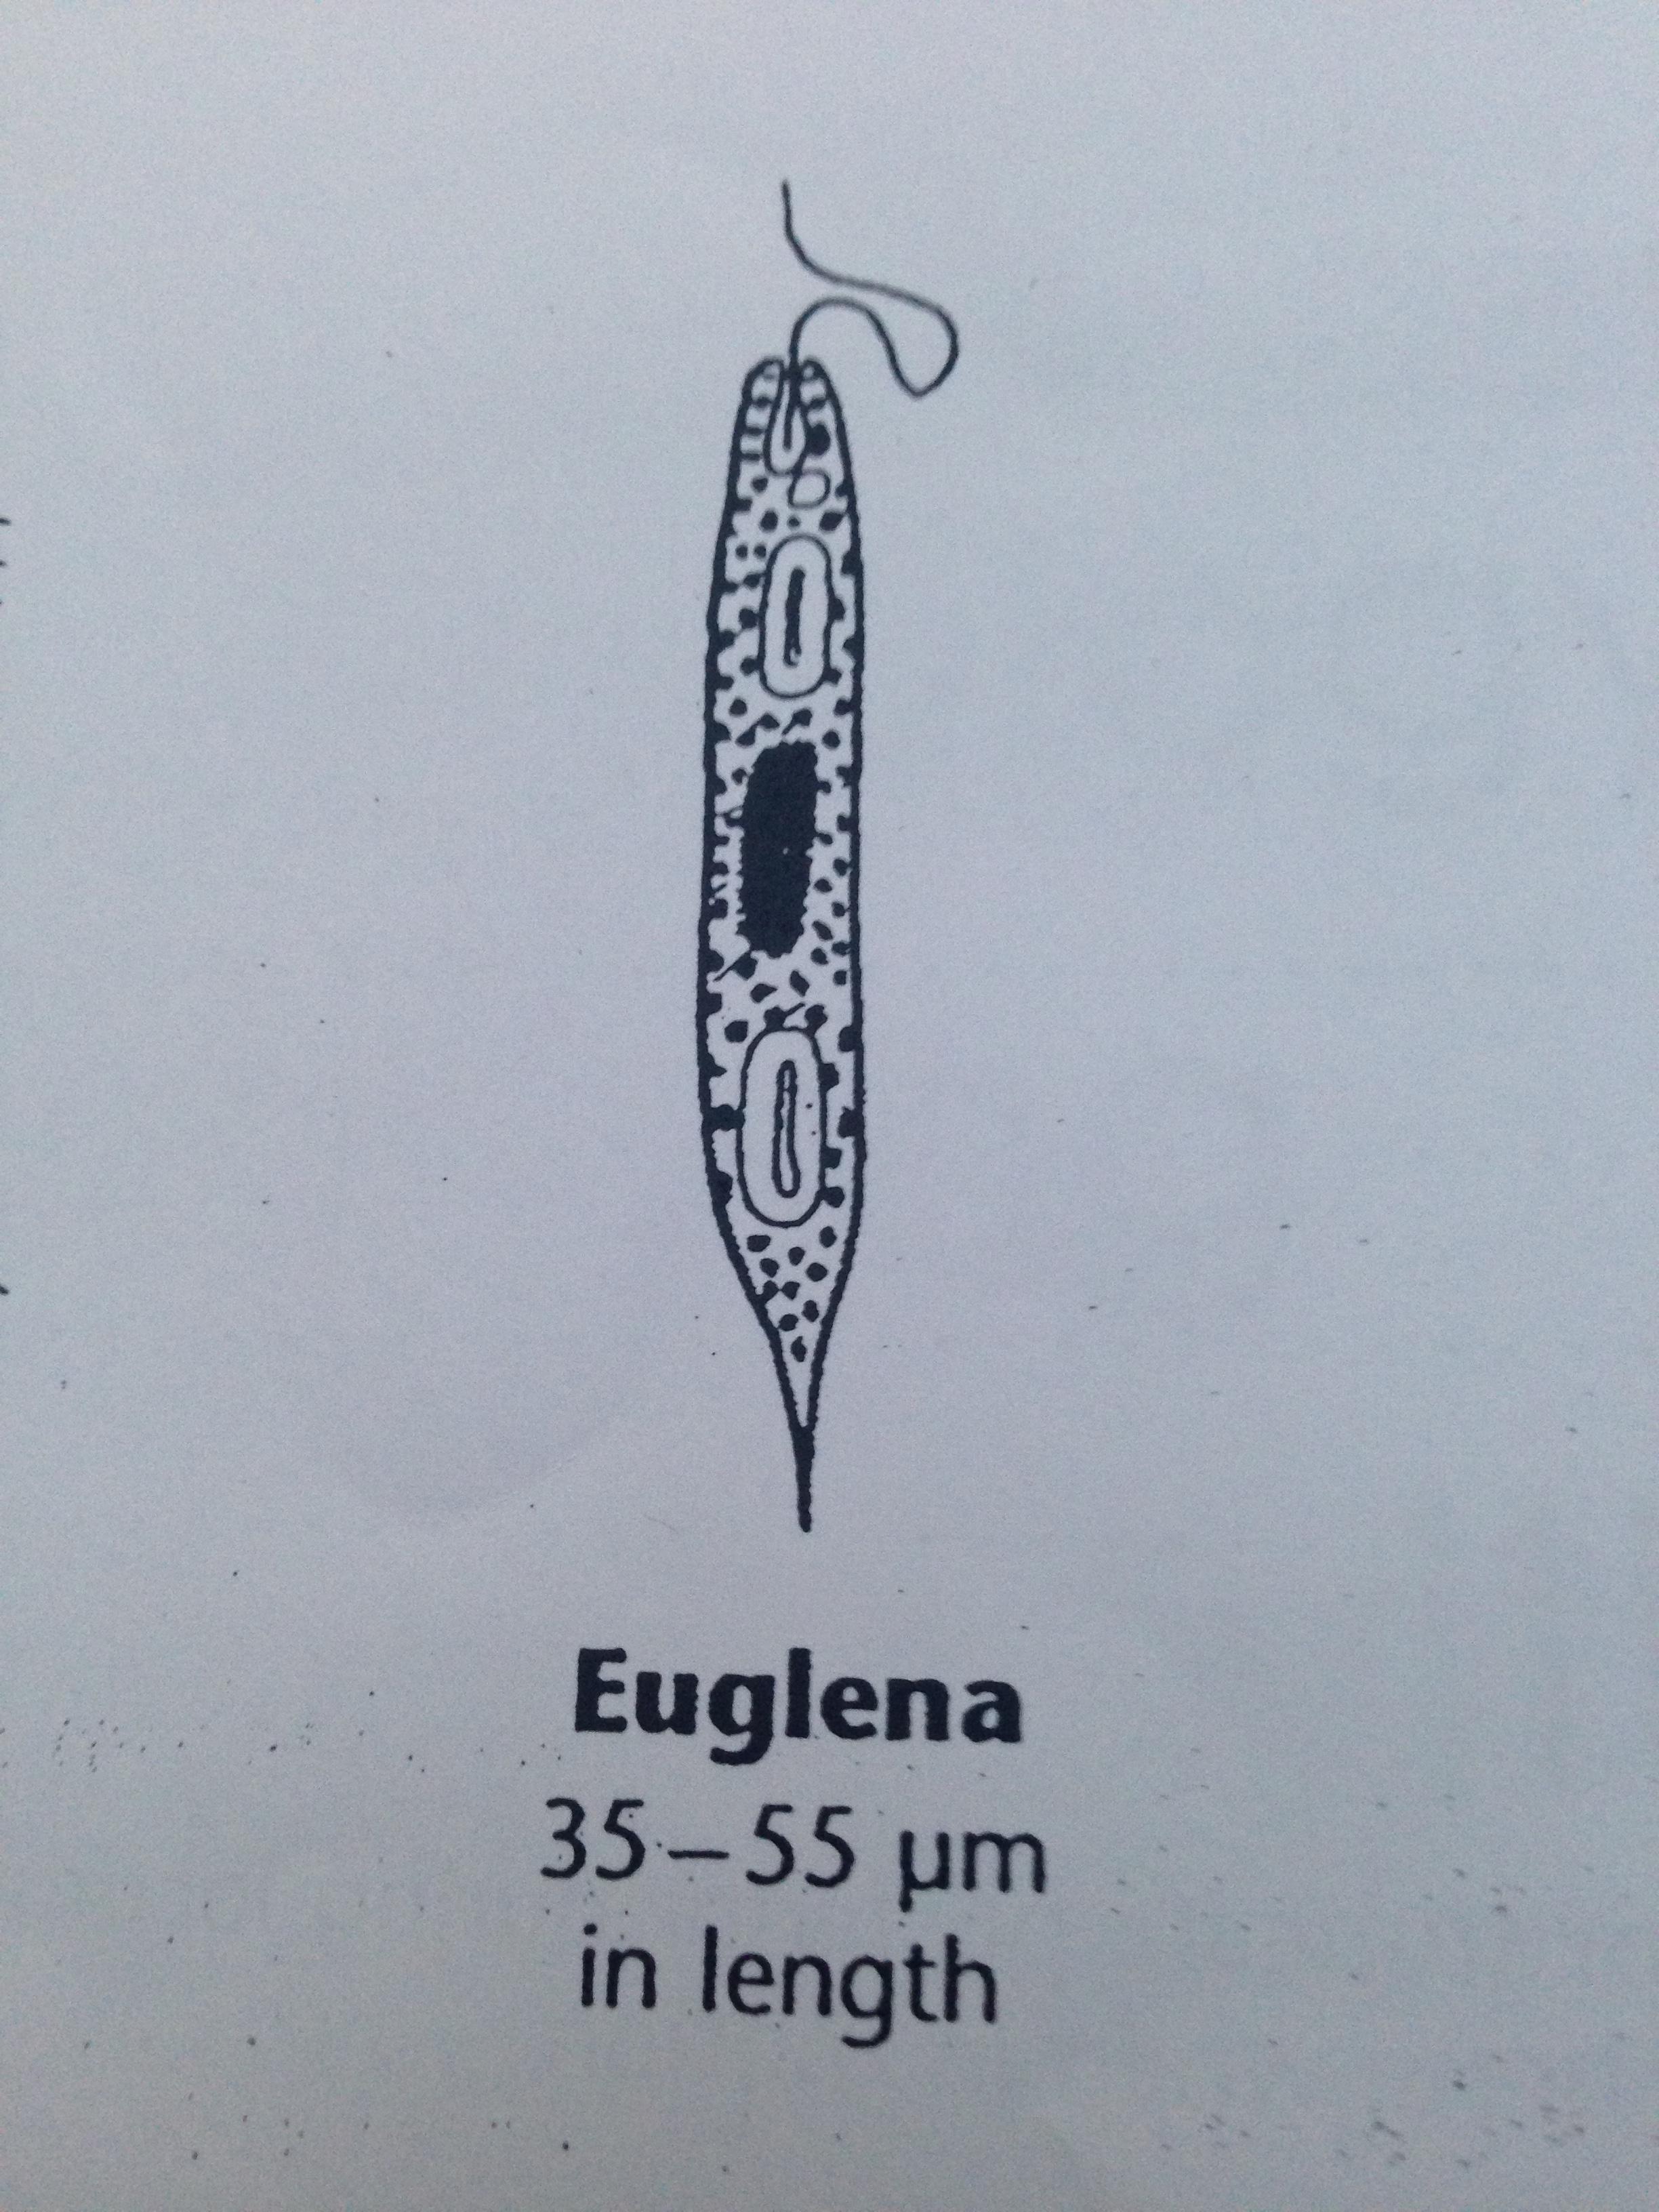 EuglenaDEF.JPG